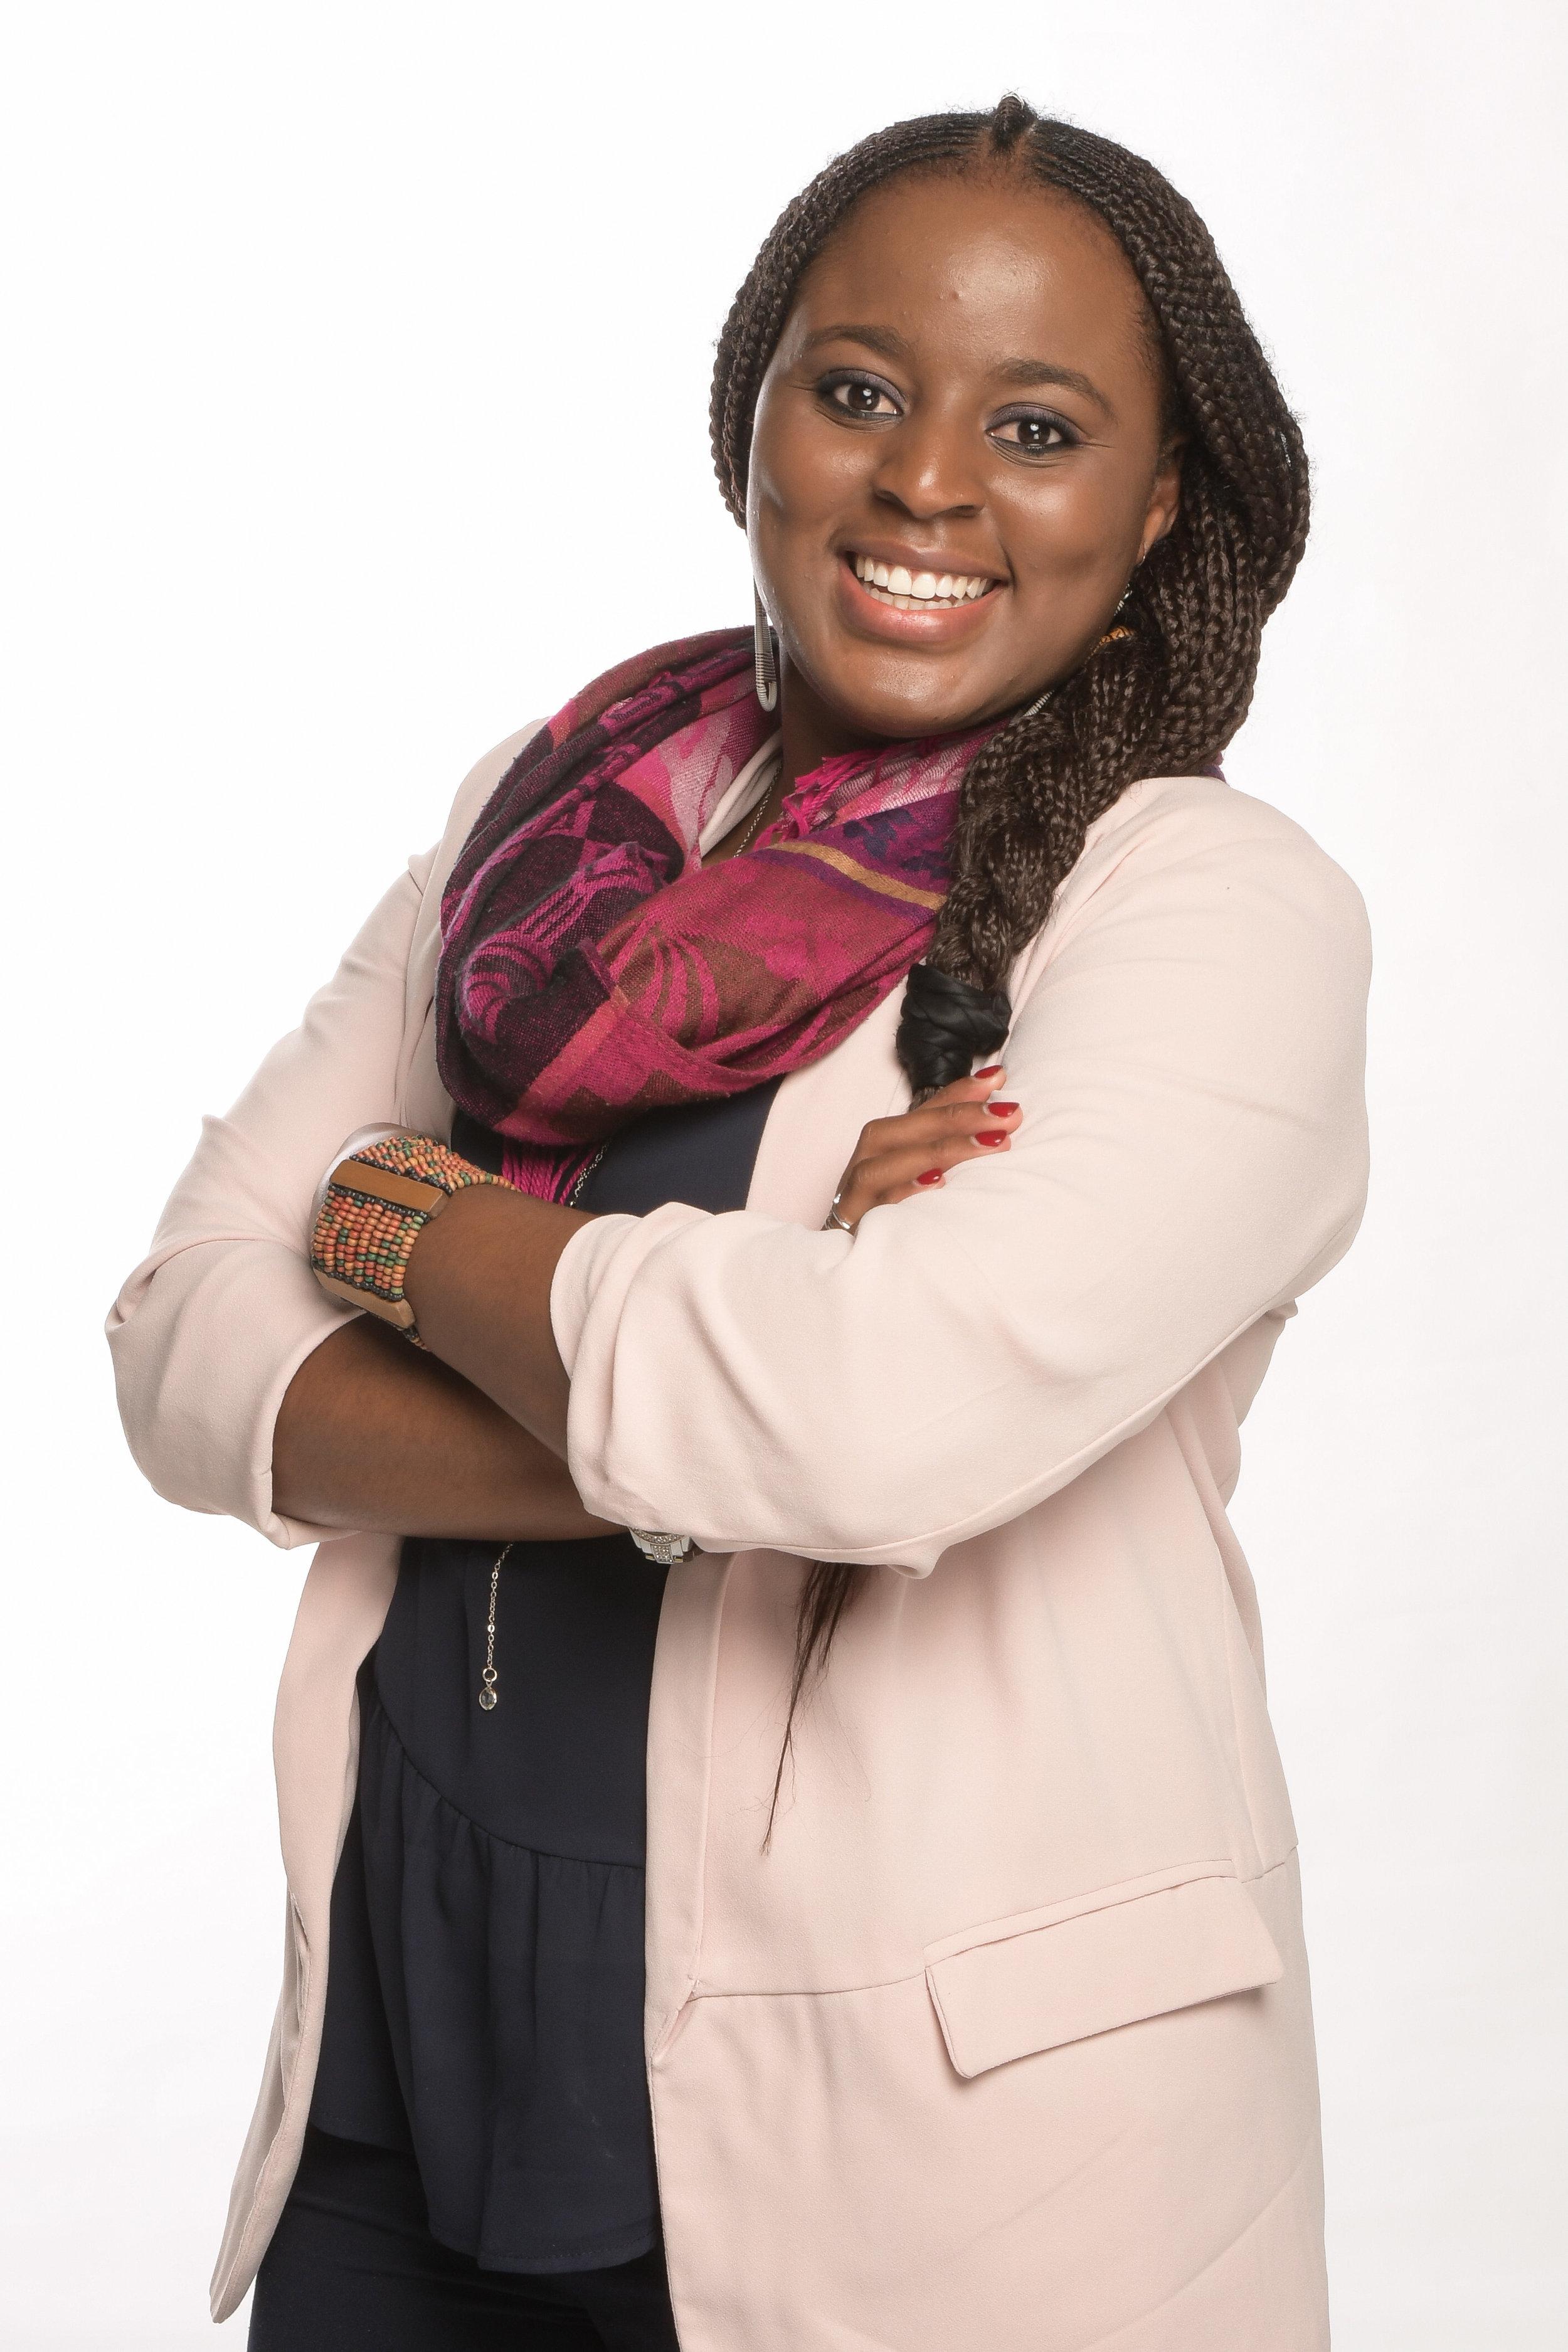 Lovelyn Nwadeyi | Founder and Director, LN Advisors